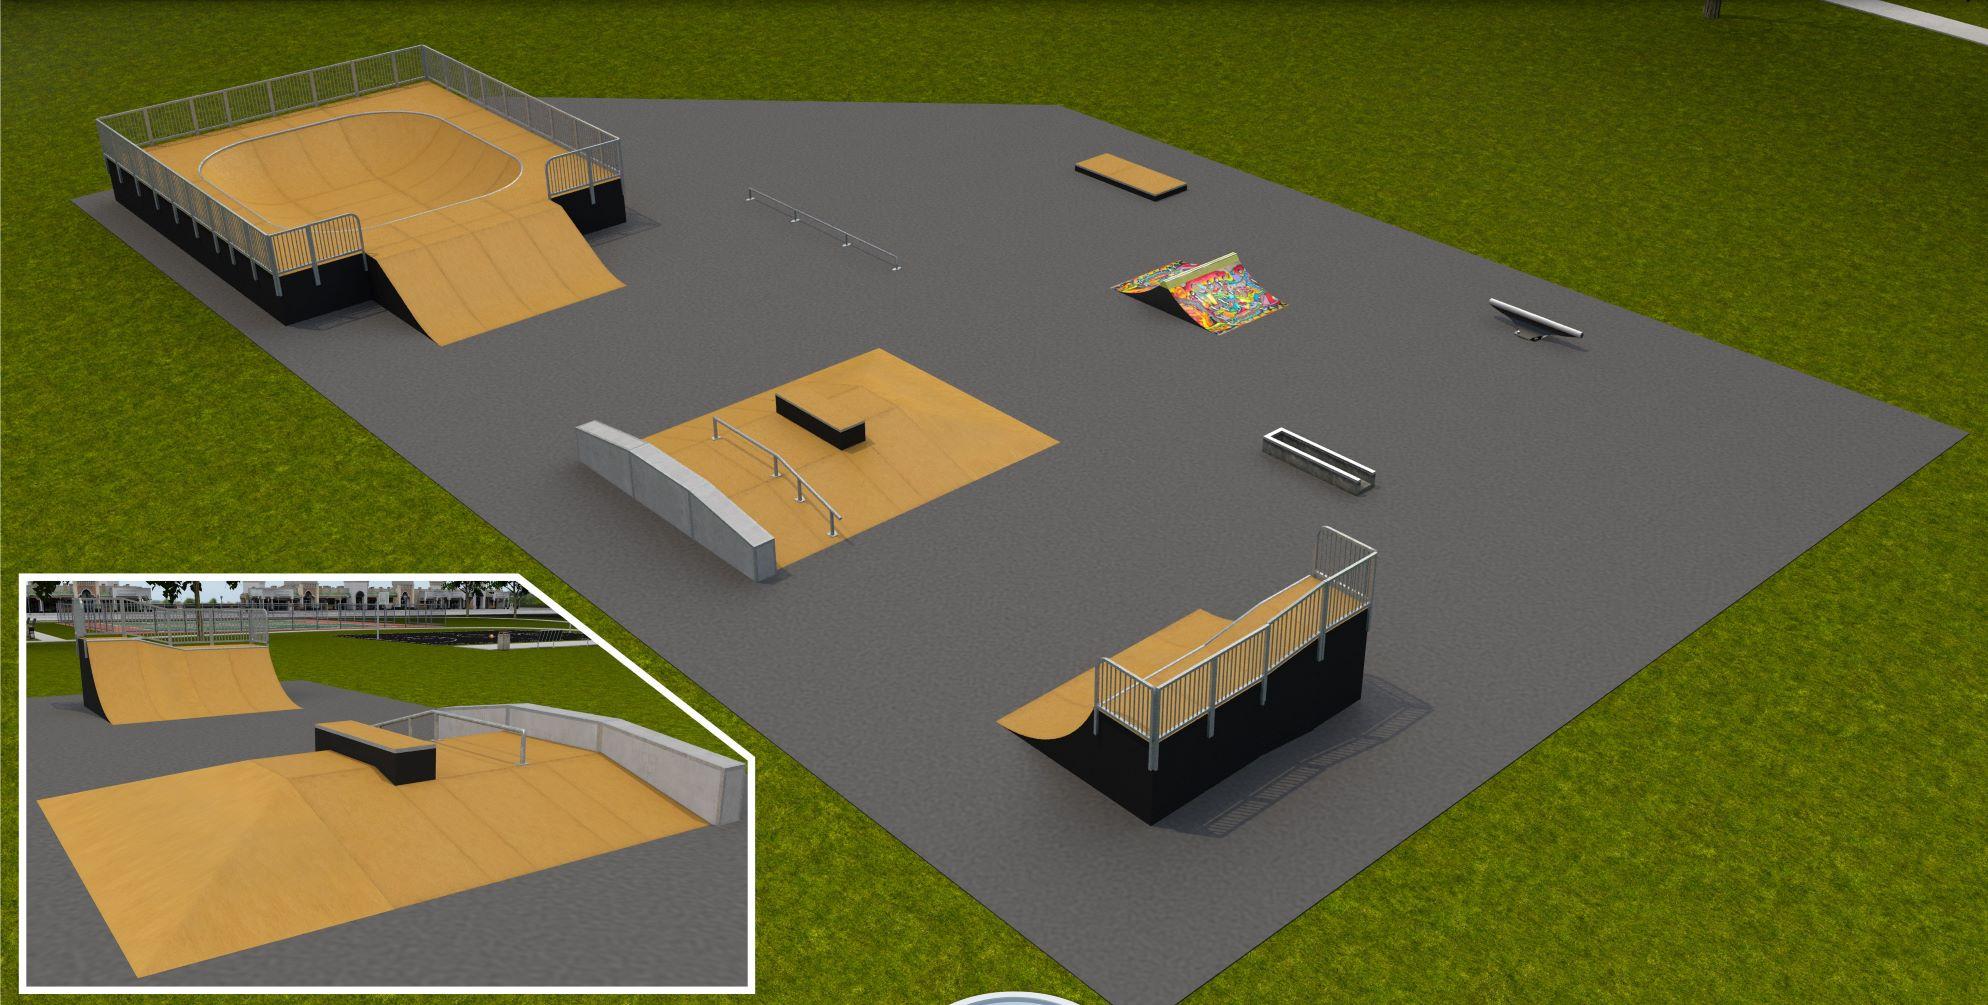 Option A: Steel Surface w/MaxGrip